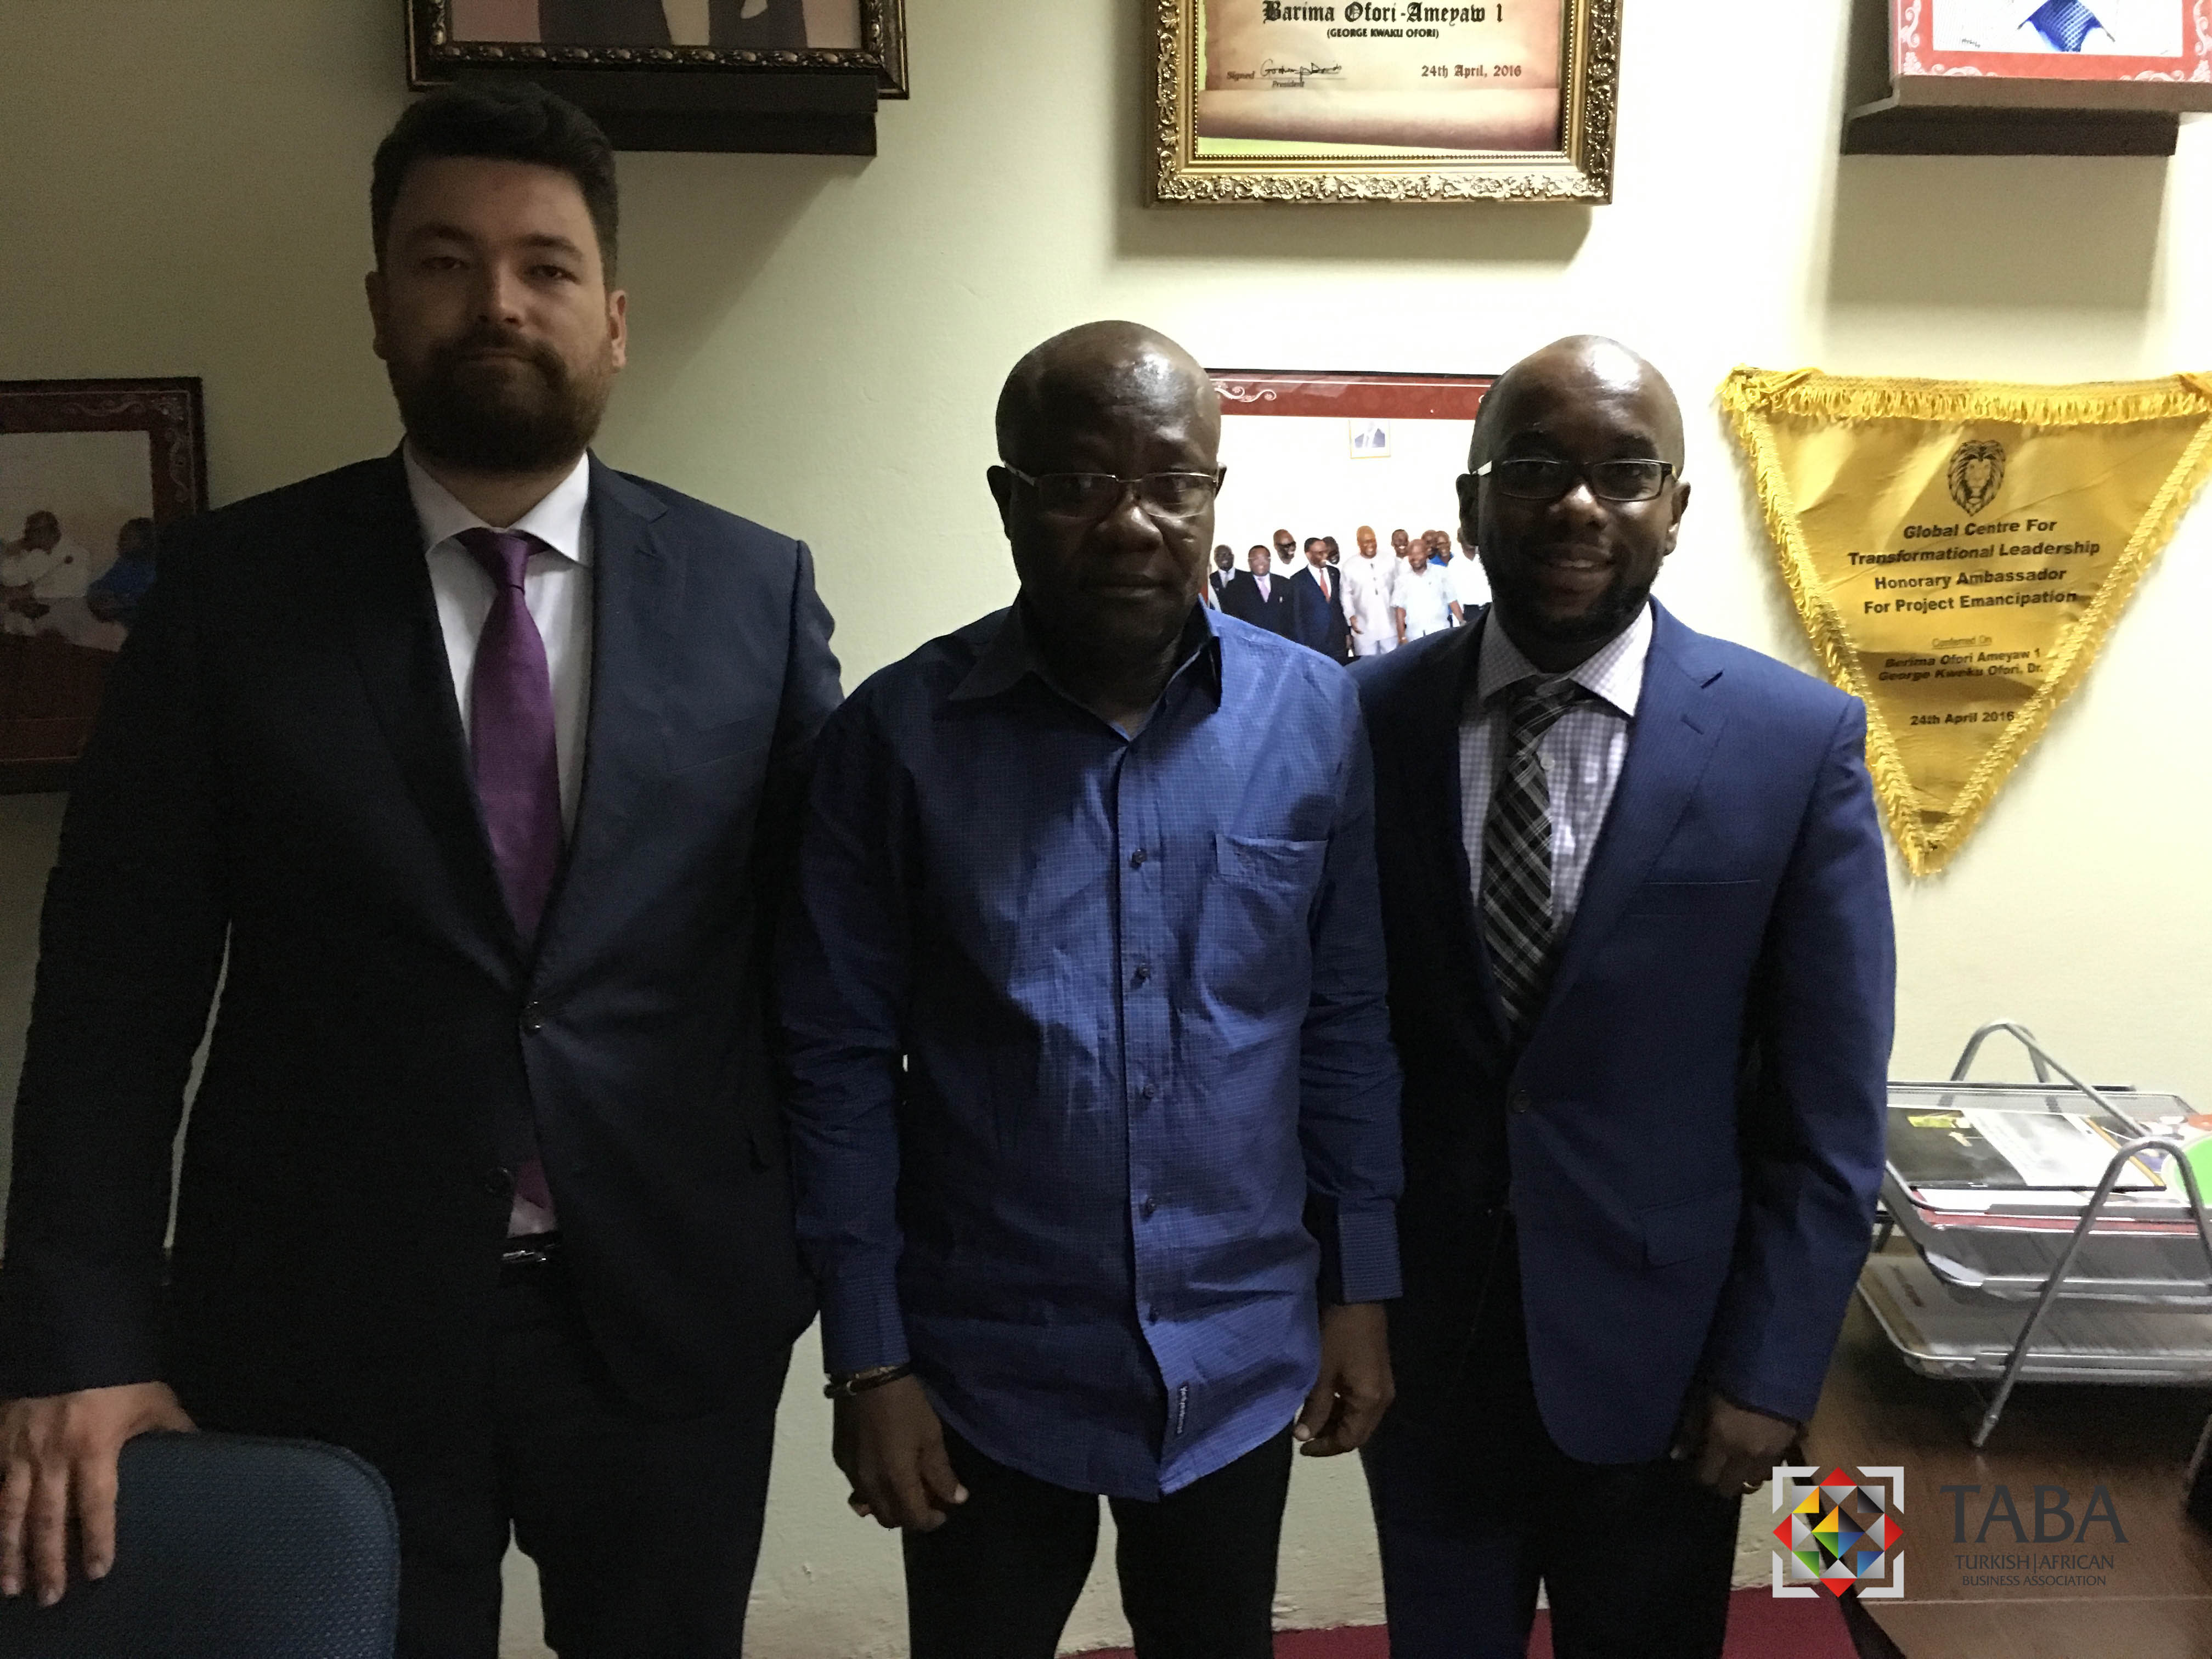 Fatih Akbulut TABA Turkish african Ghana (5)